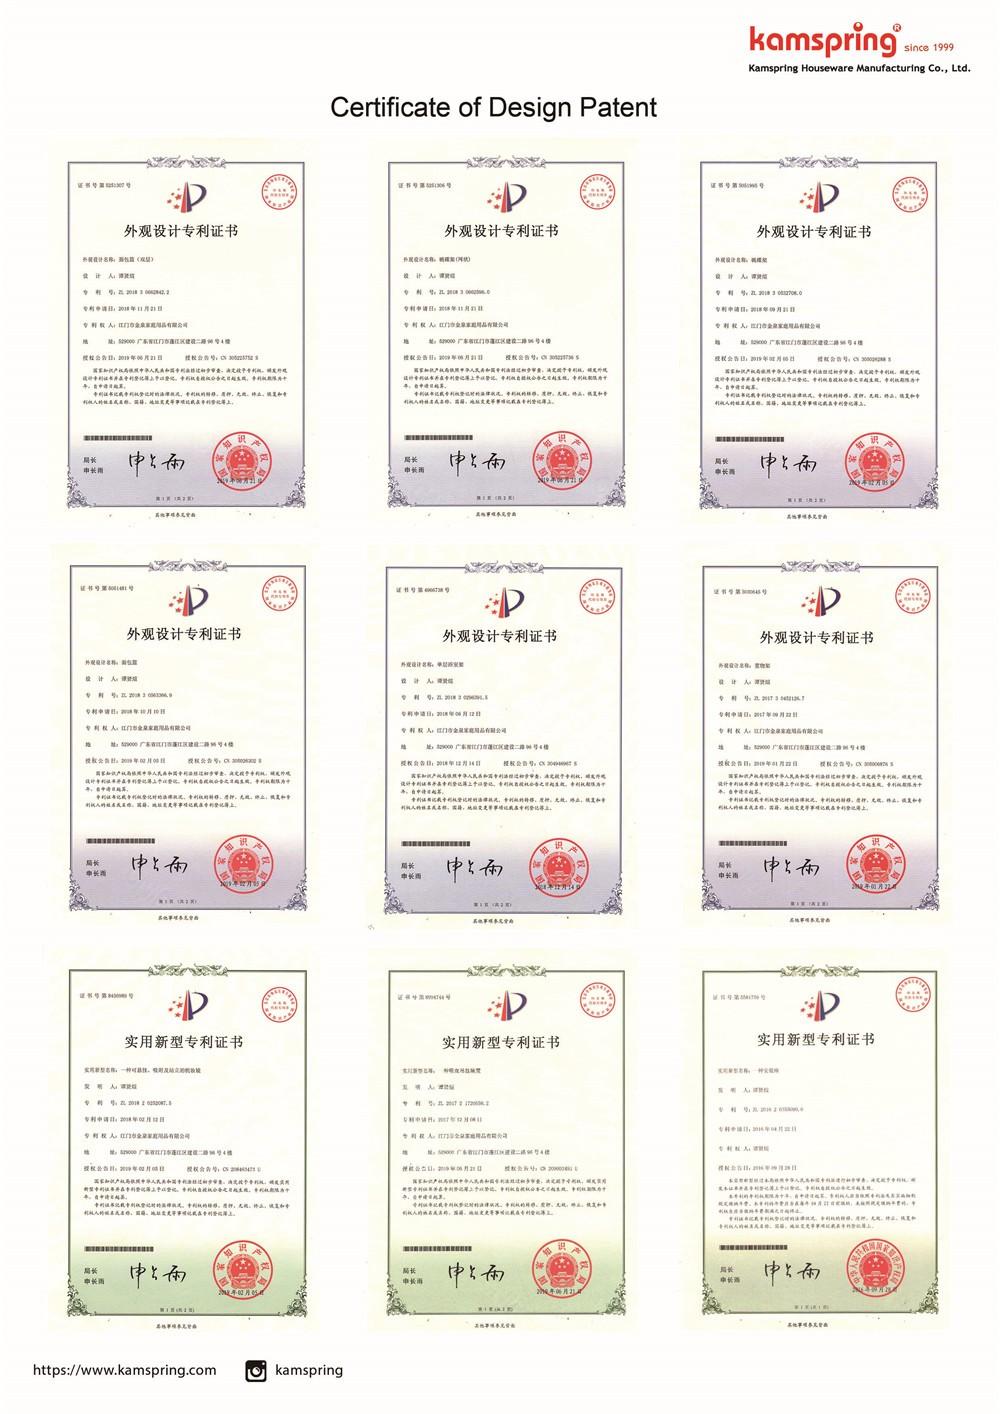 Certificate of Design Patent 小图.jpg